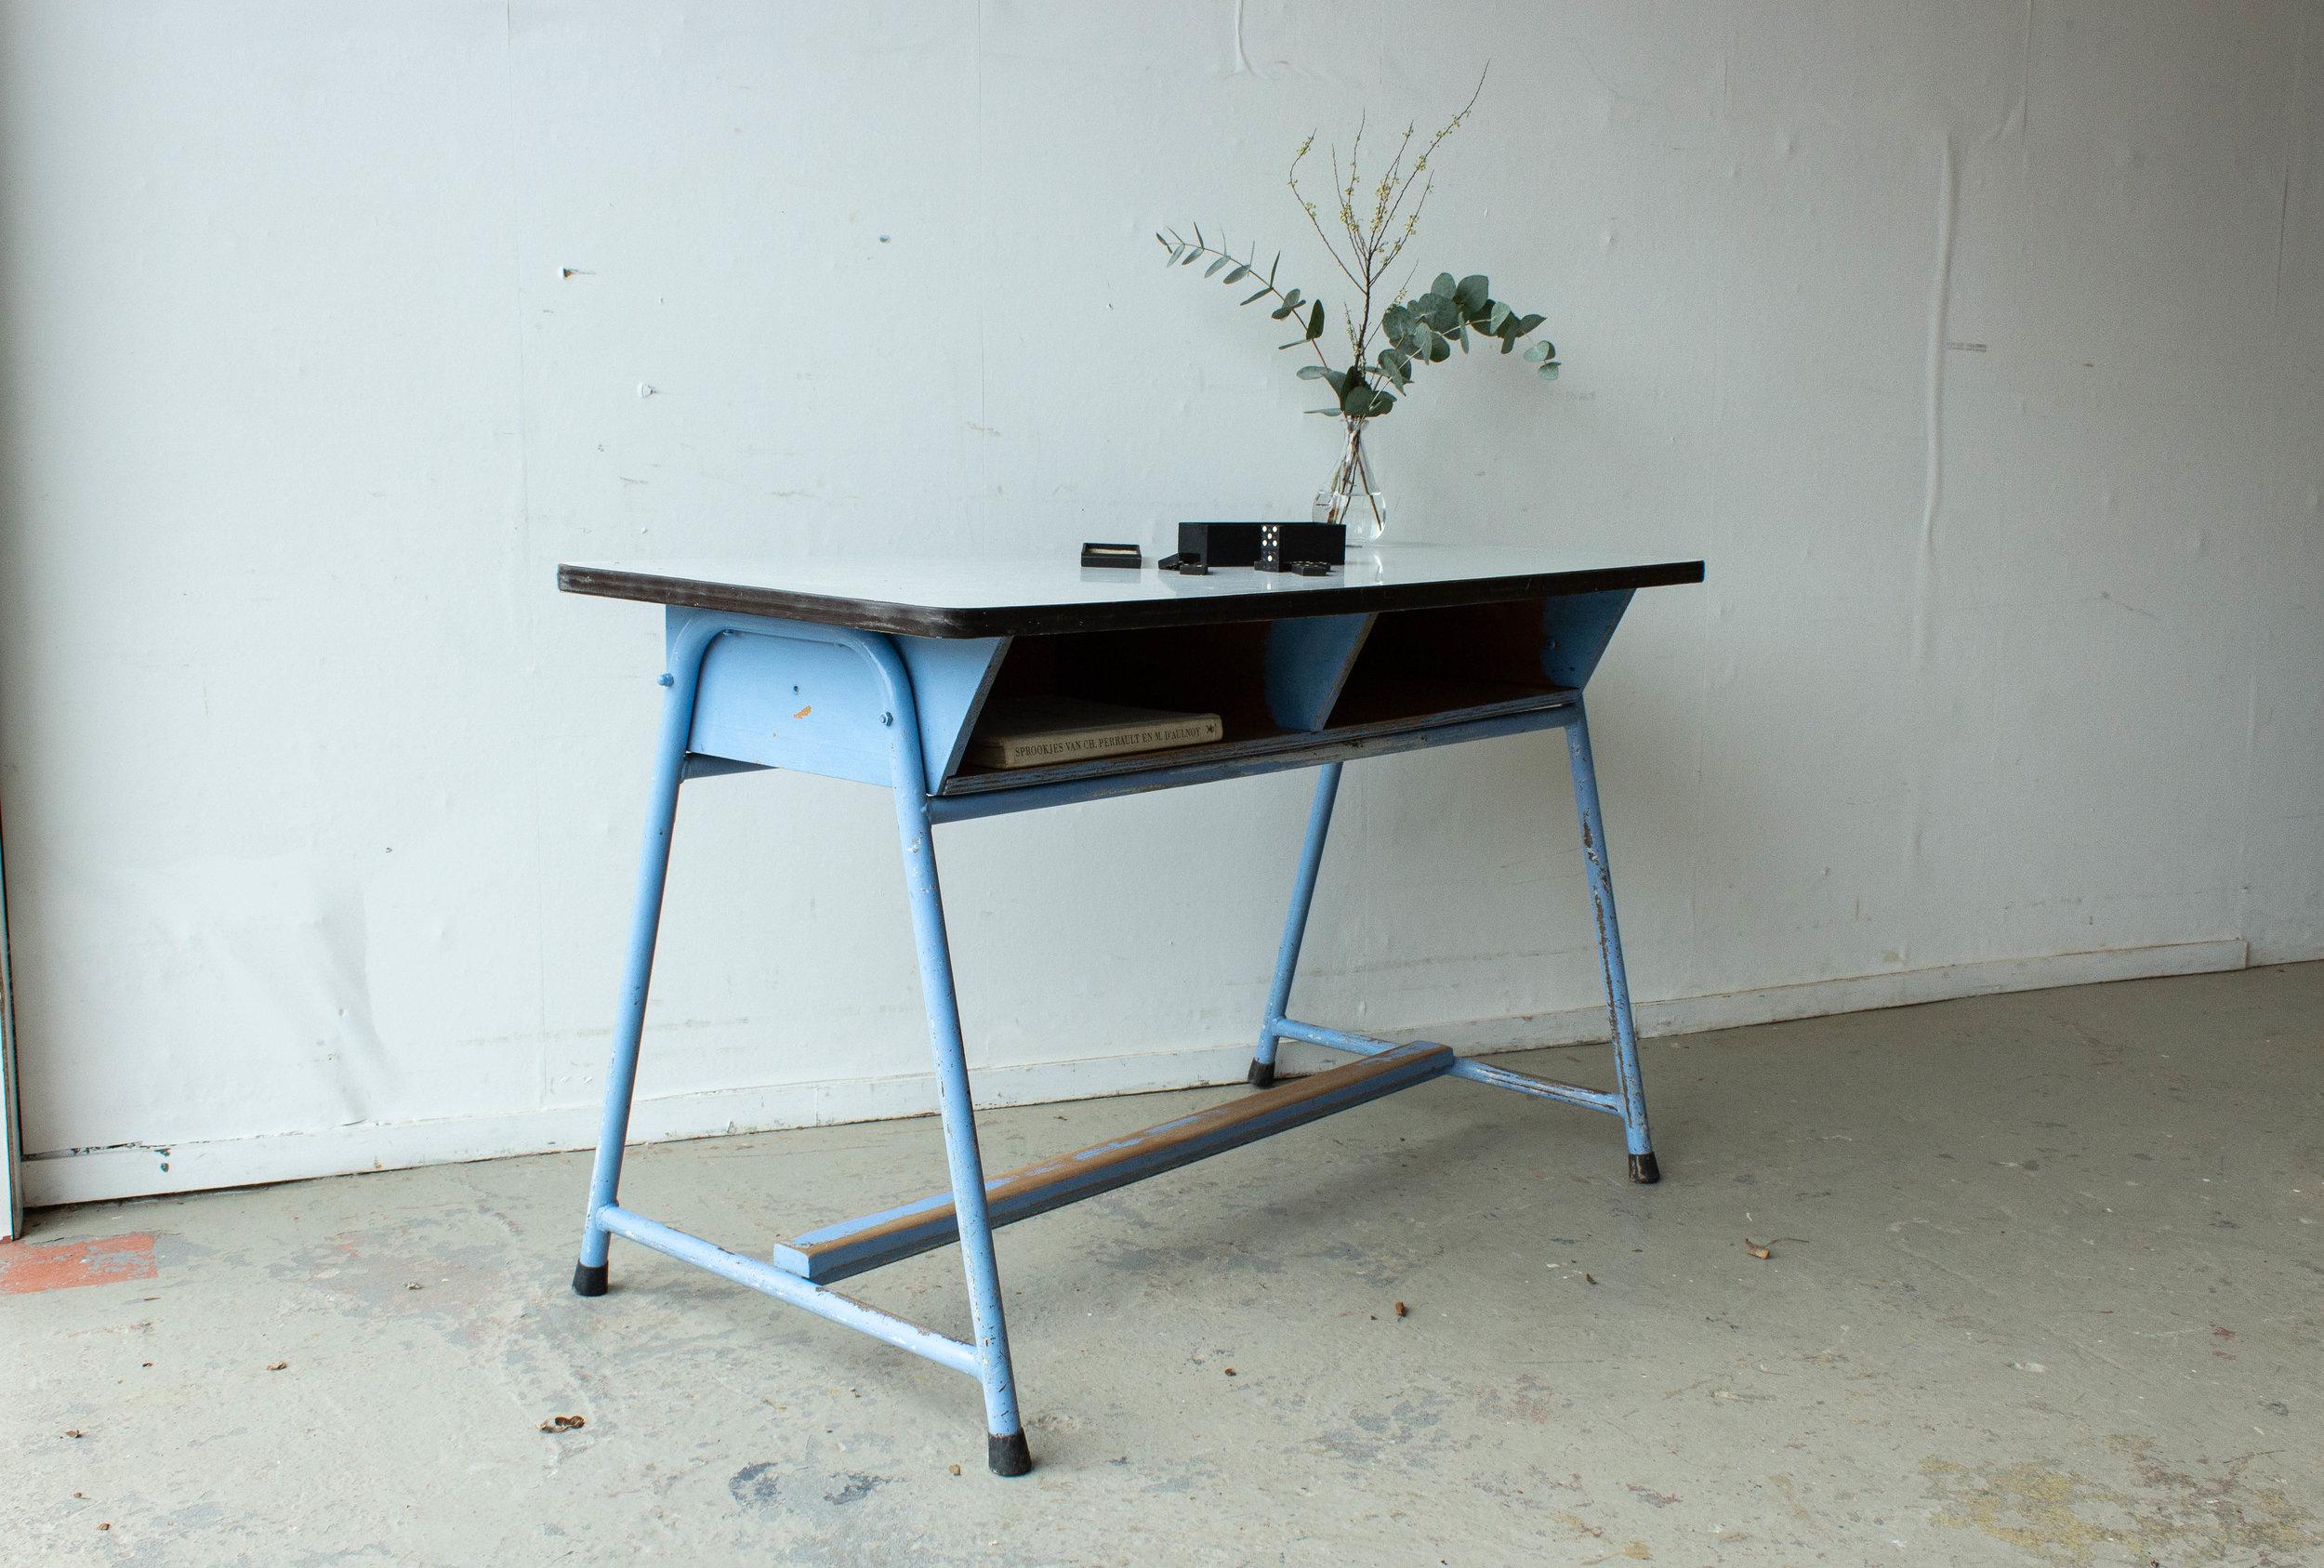 3137-4 - Lavendlblauwe vintage schooltafel.jpg